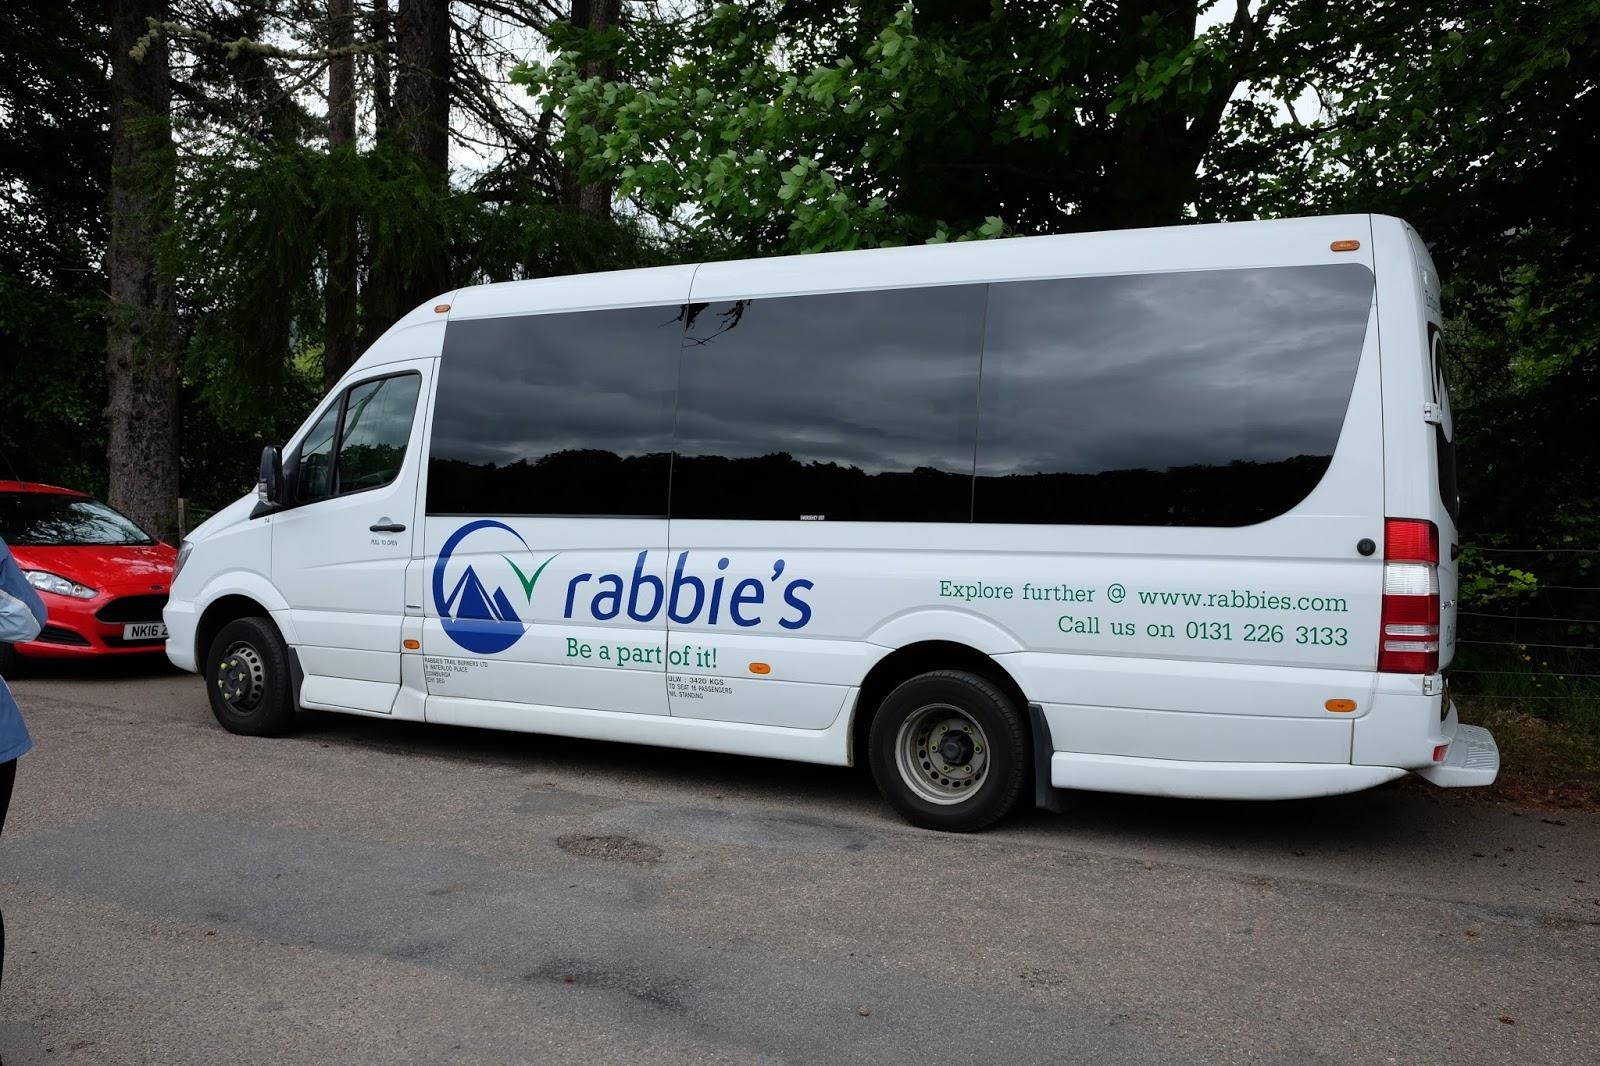 Https Www Rabbies Com En Scotland Tours From Edinburgh   Day Tours